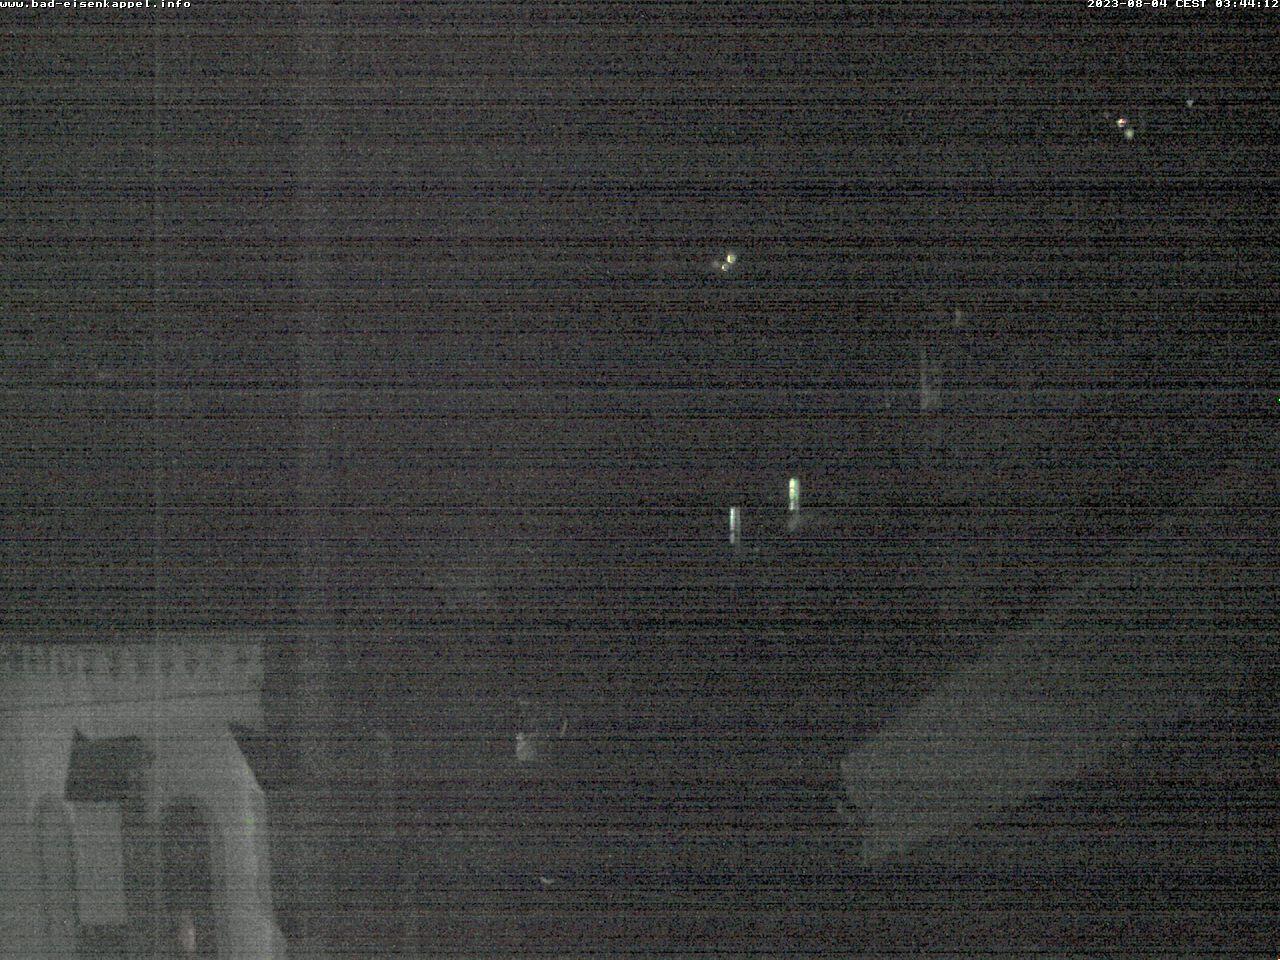 Webcam-Livebild Hauptplatz Eisenkappel